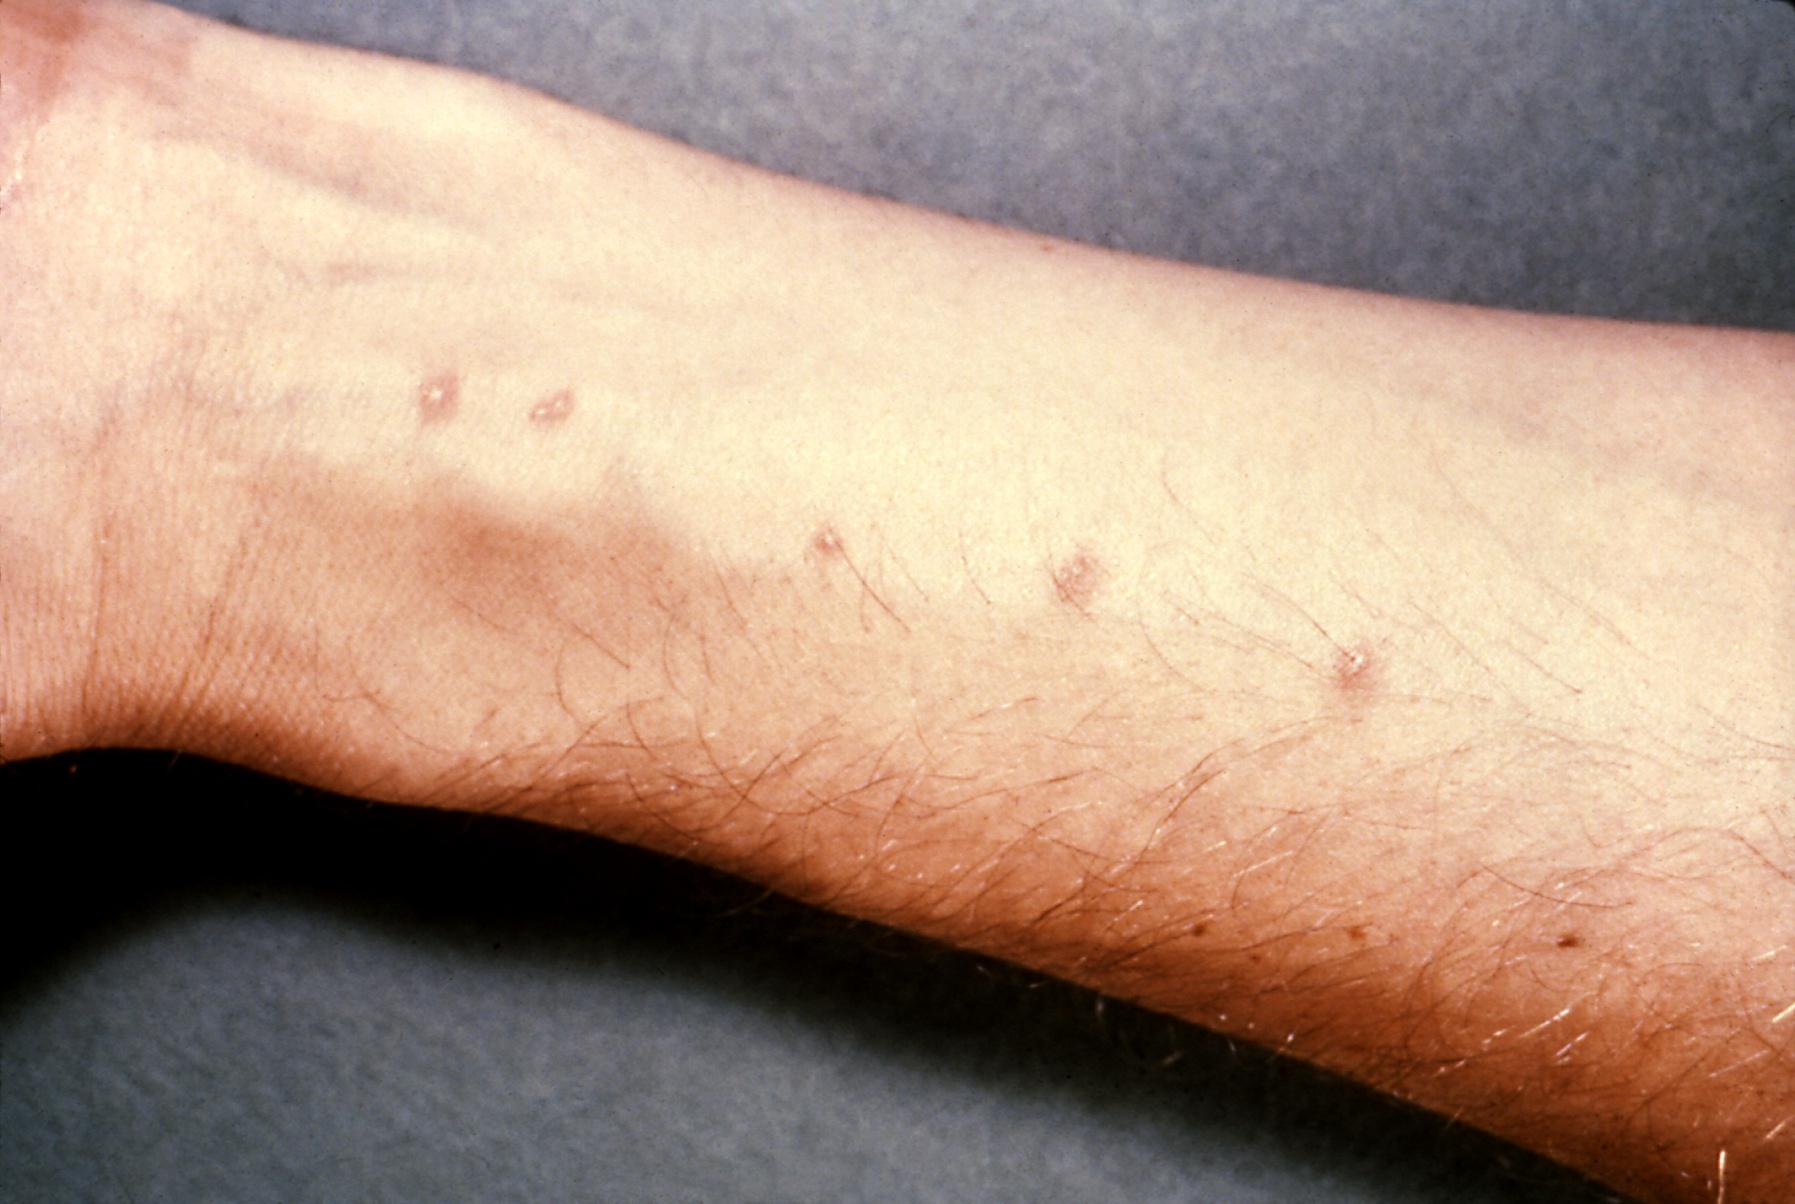 giardia symptoms rash